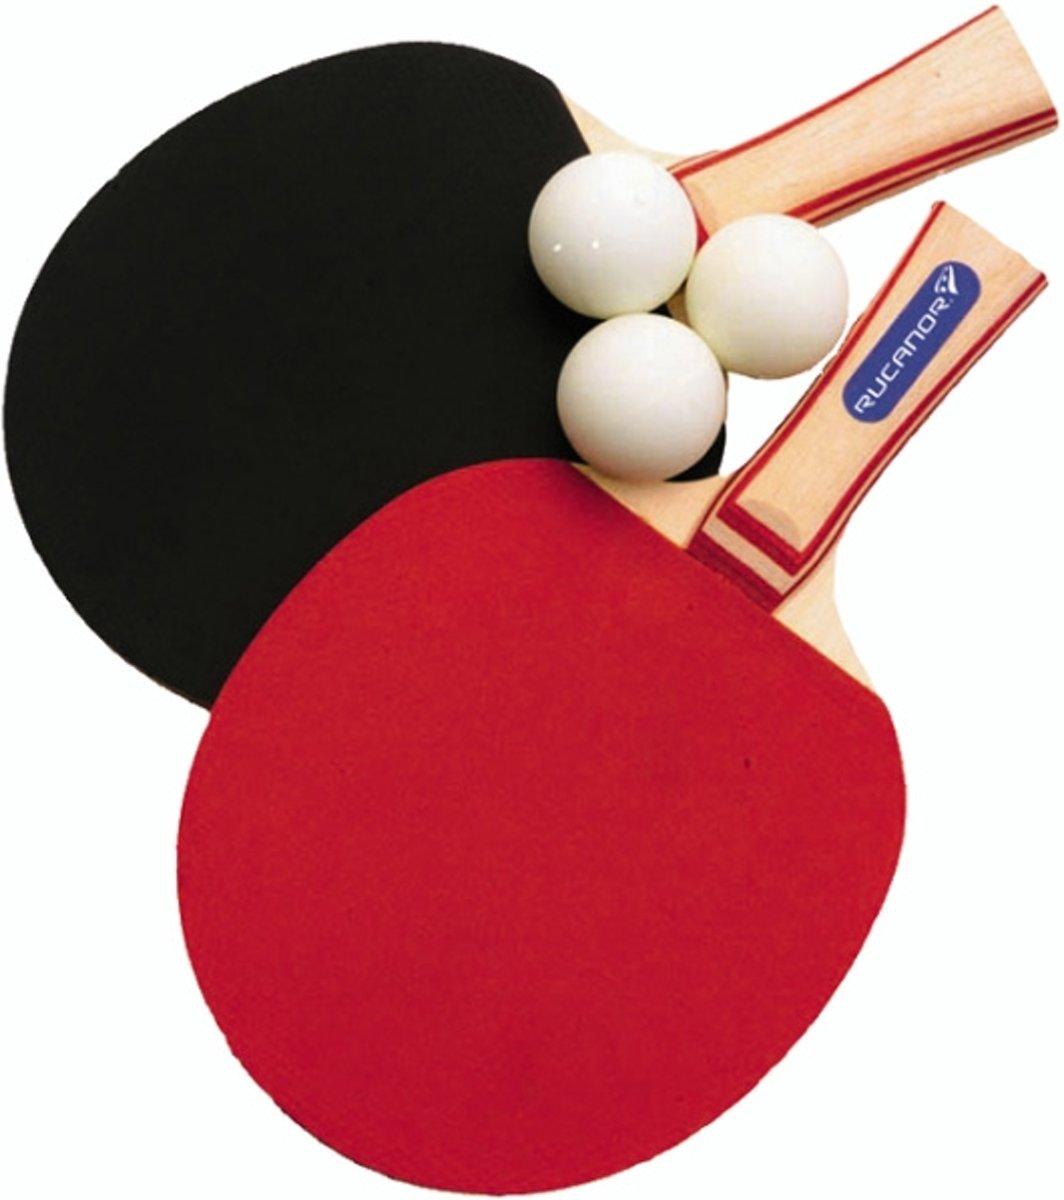 Rucanor Super Tafeltennis Batjes Set - Rood